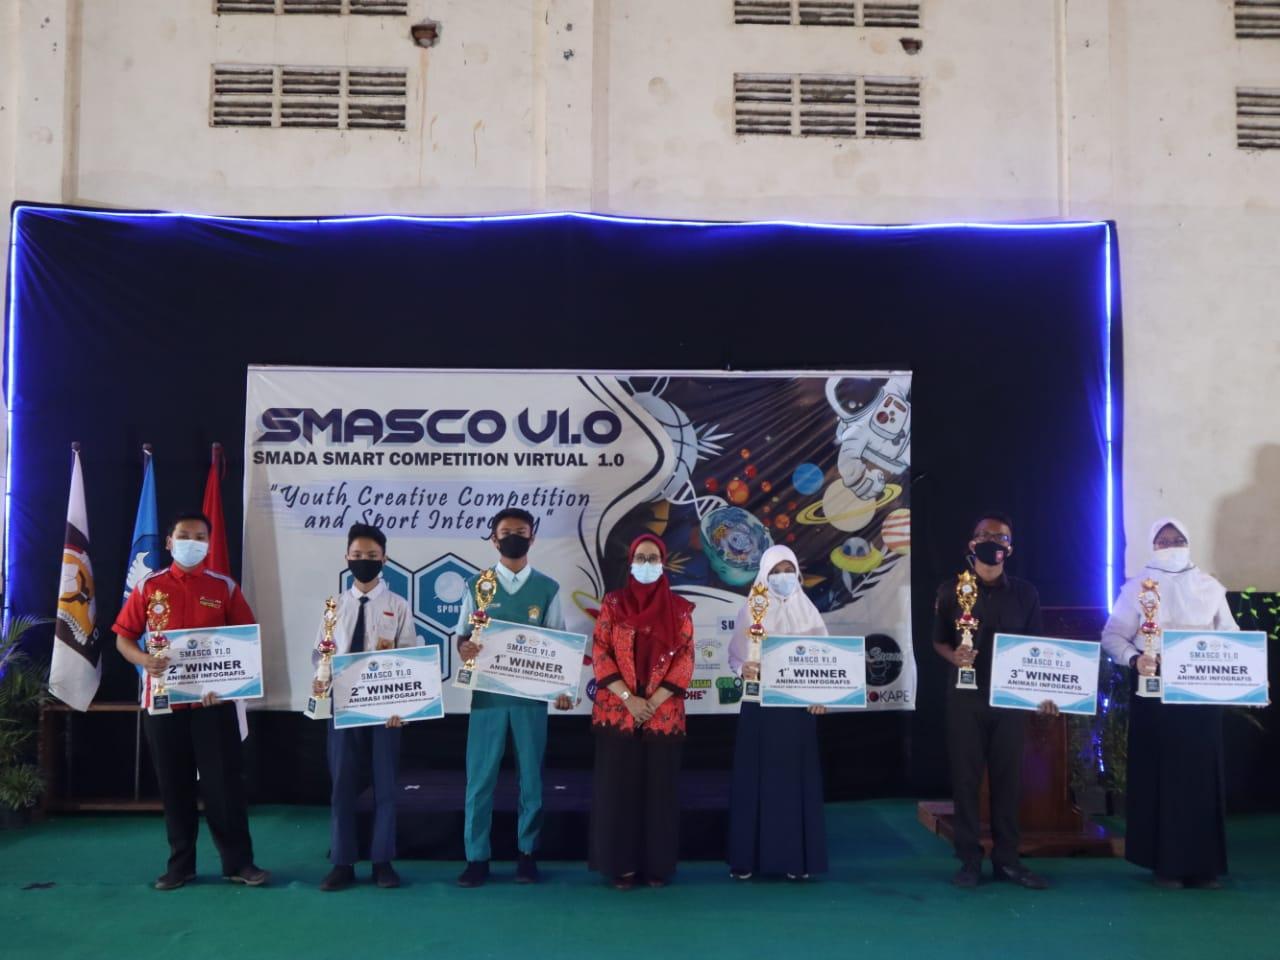 "Penyerahan Penghargaan Smasco V1.0 (Smada Smart Competition Virtual 1.0 ""Youth Creative Competition and Sport Integrity"" kepada Mohdi Siswa MandaPro Exist"